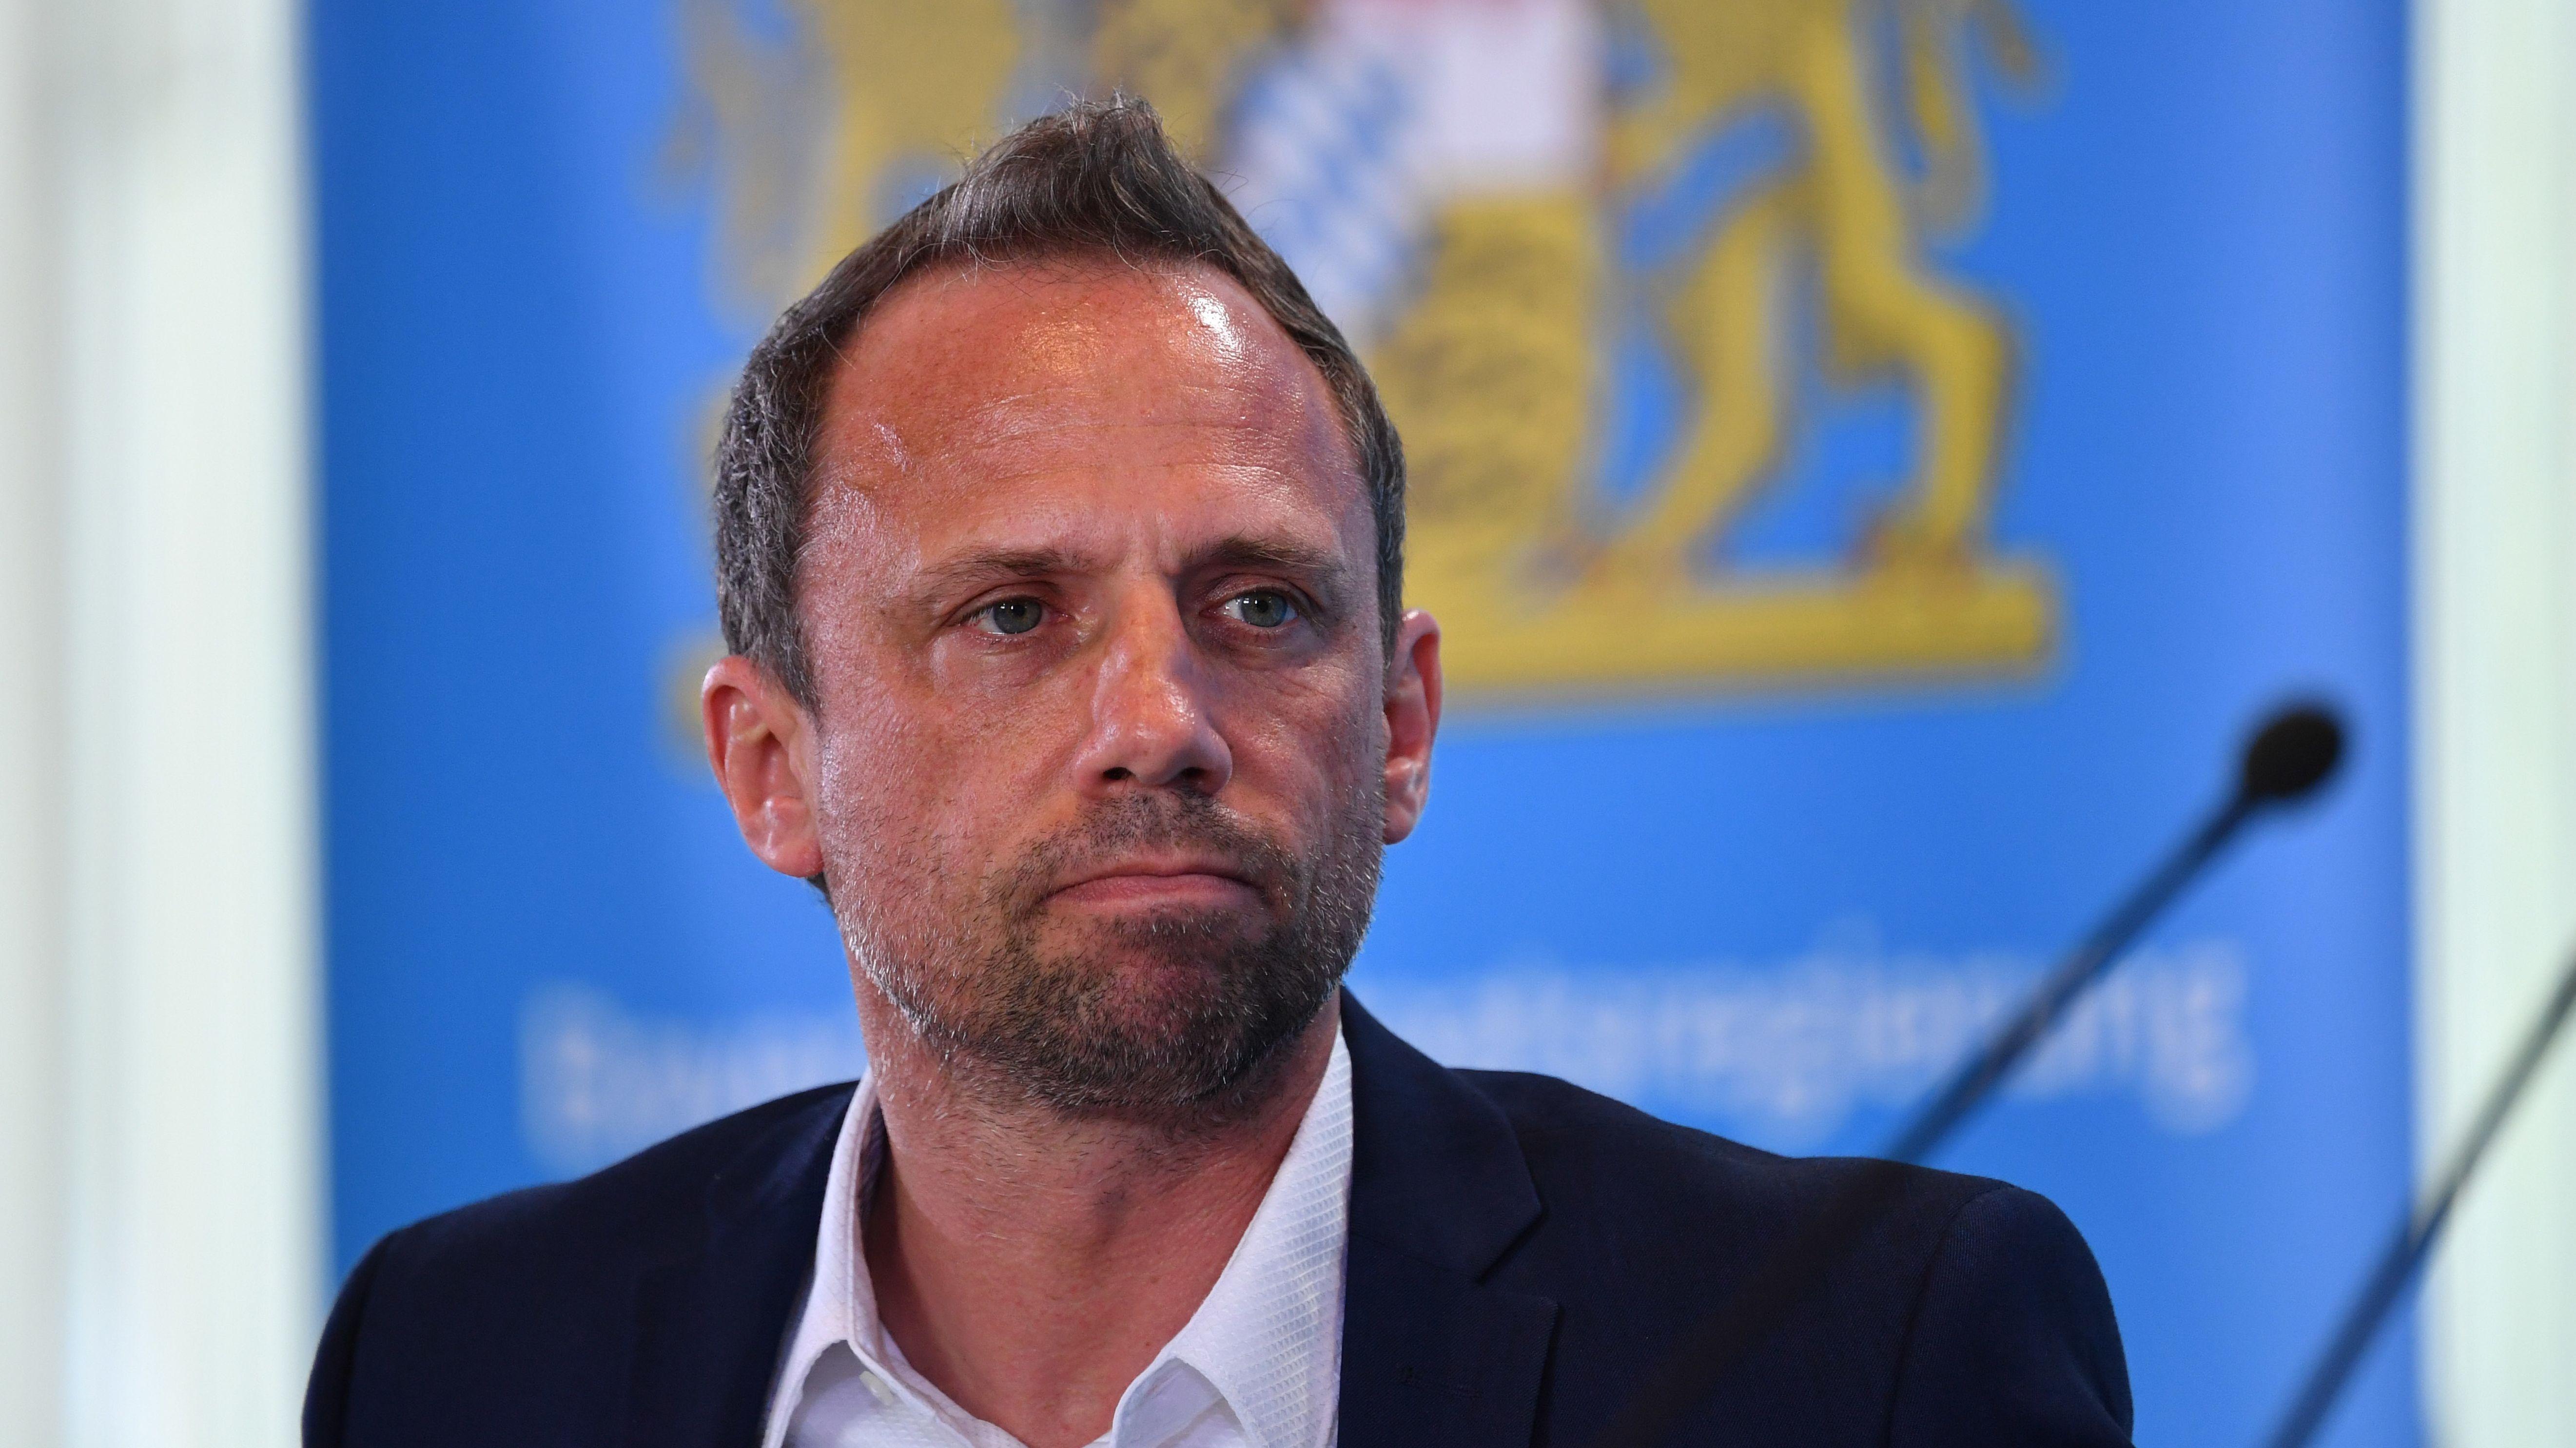 Bayerns Umweltminister Glauber